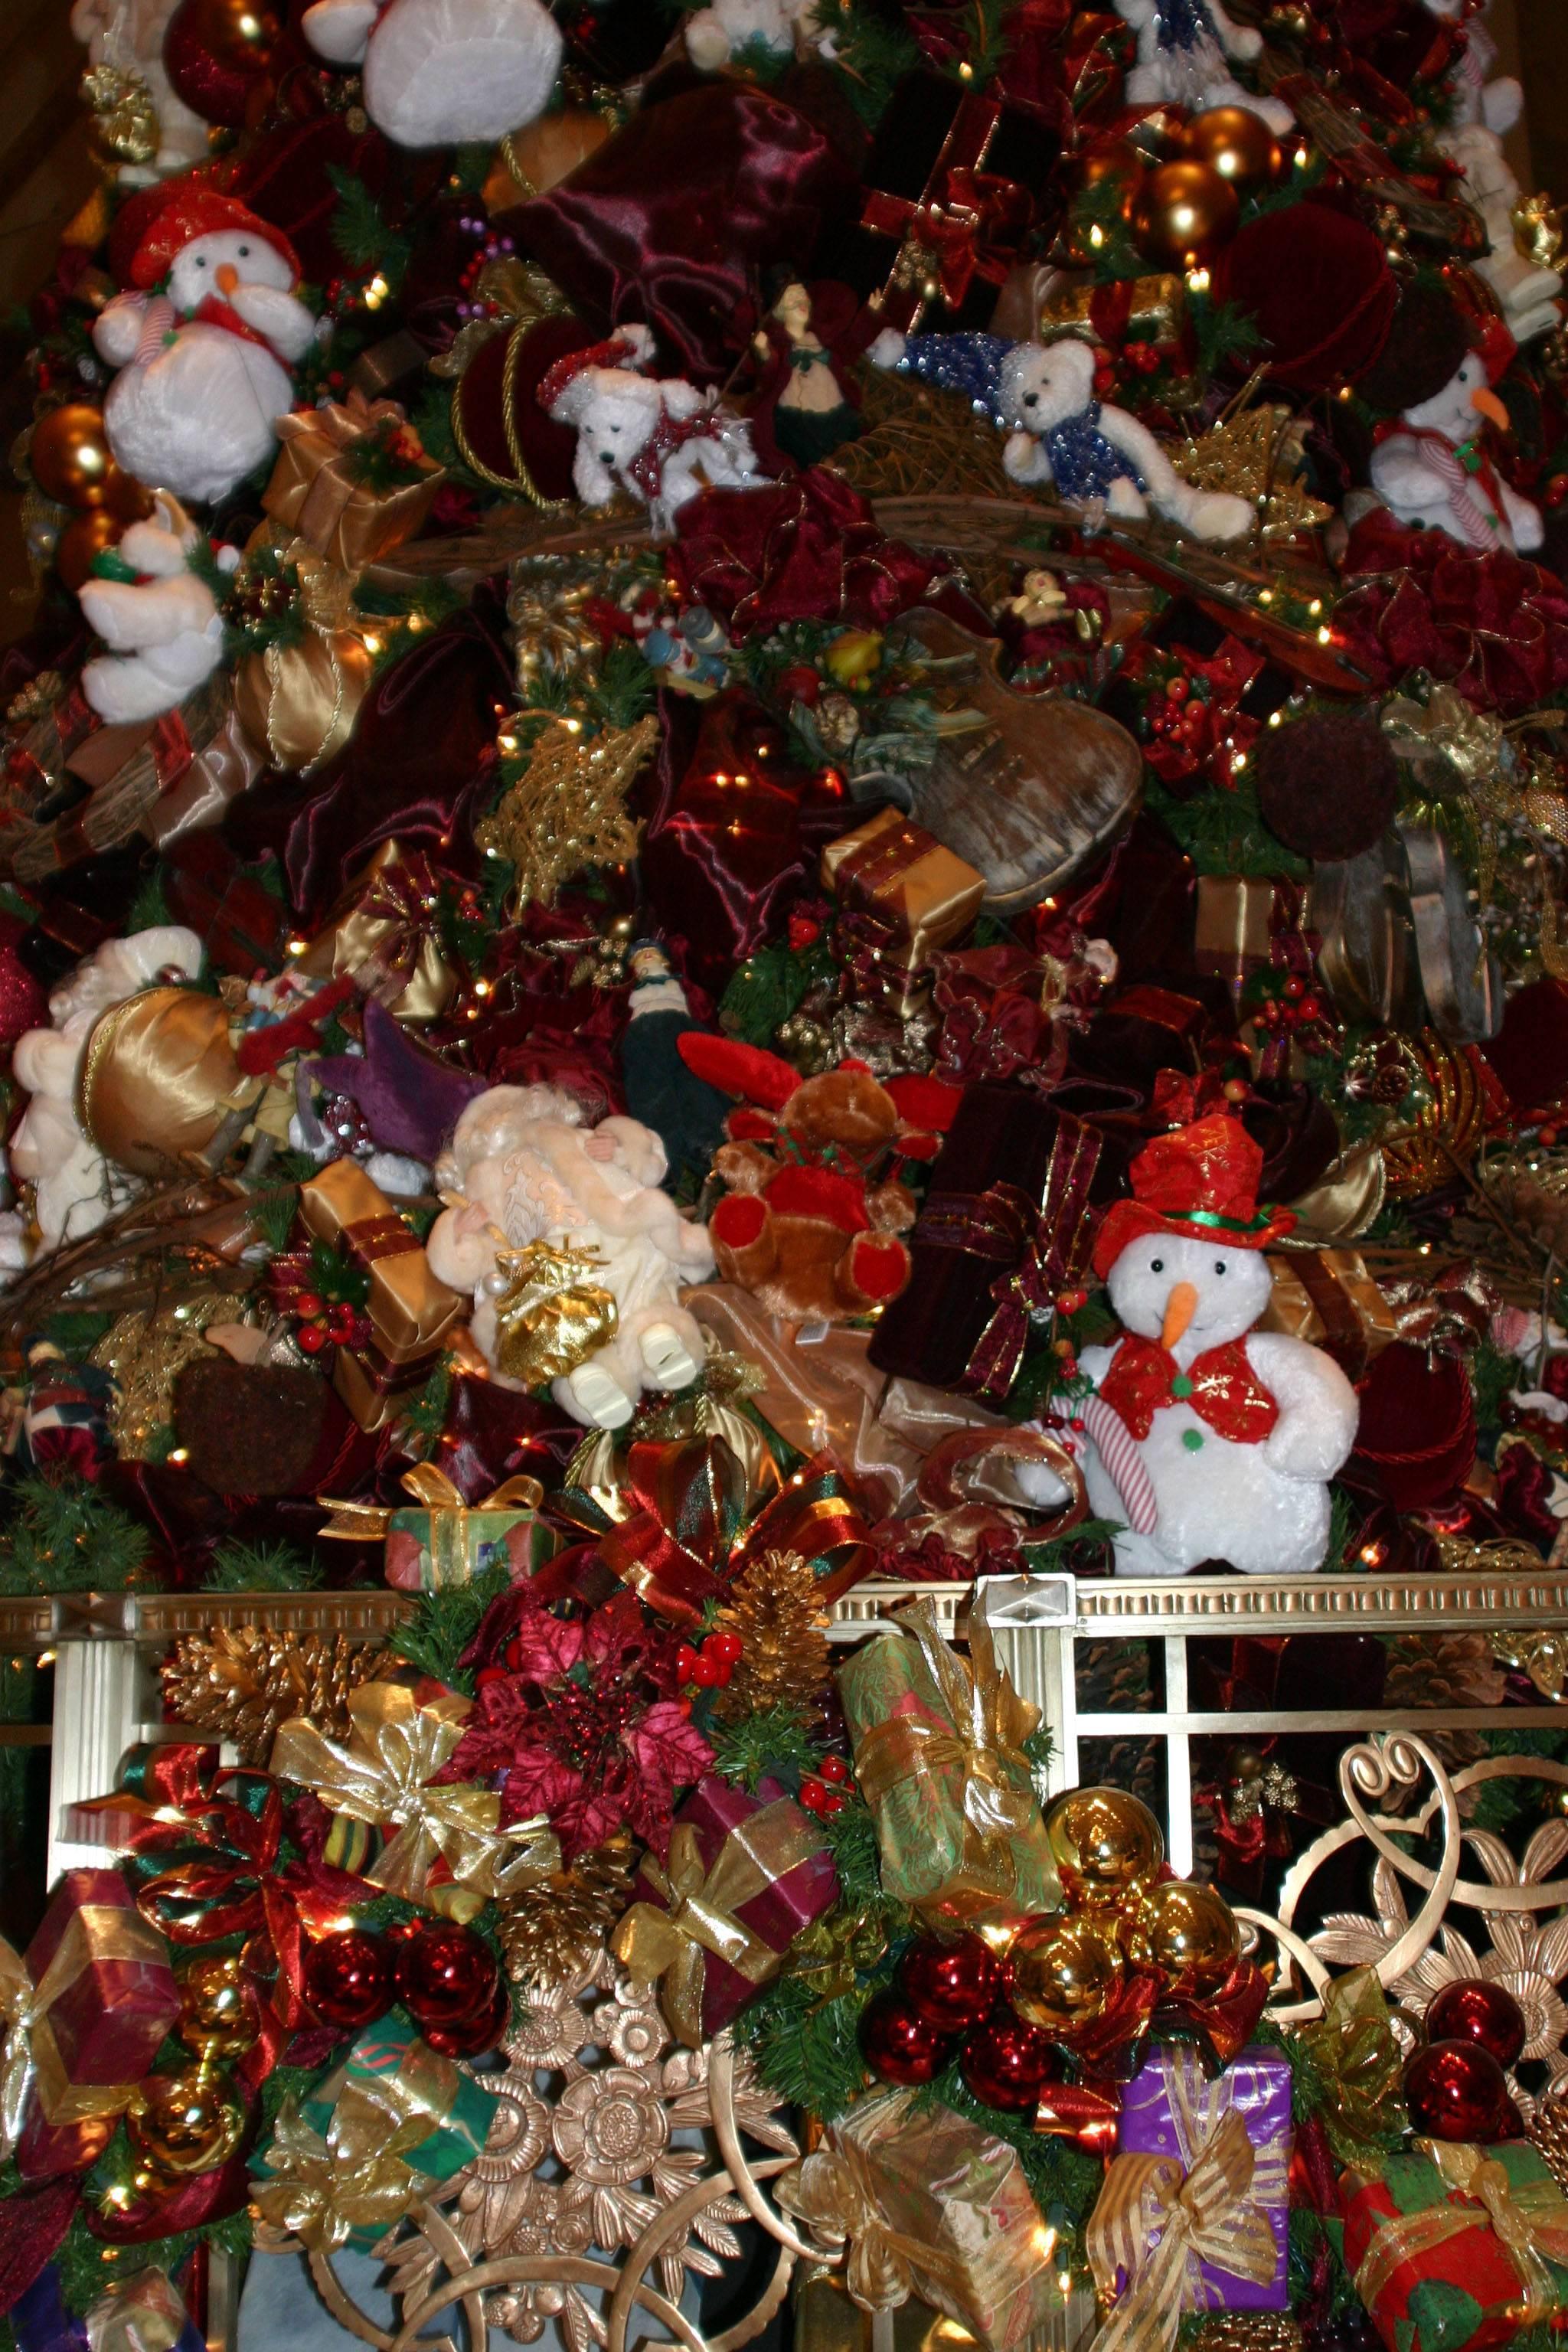 Christmas Tree Decorations Waldorf Astoria Hotel Lobby Photo